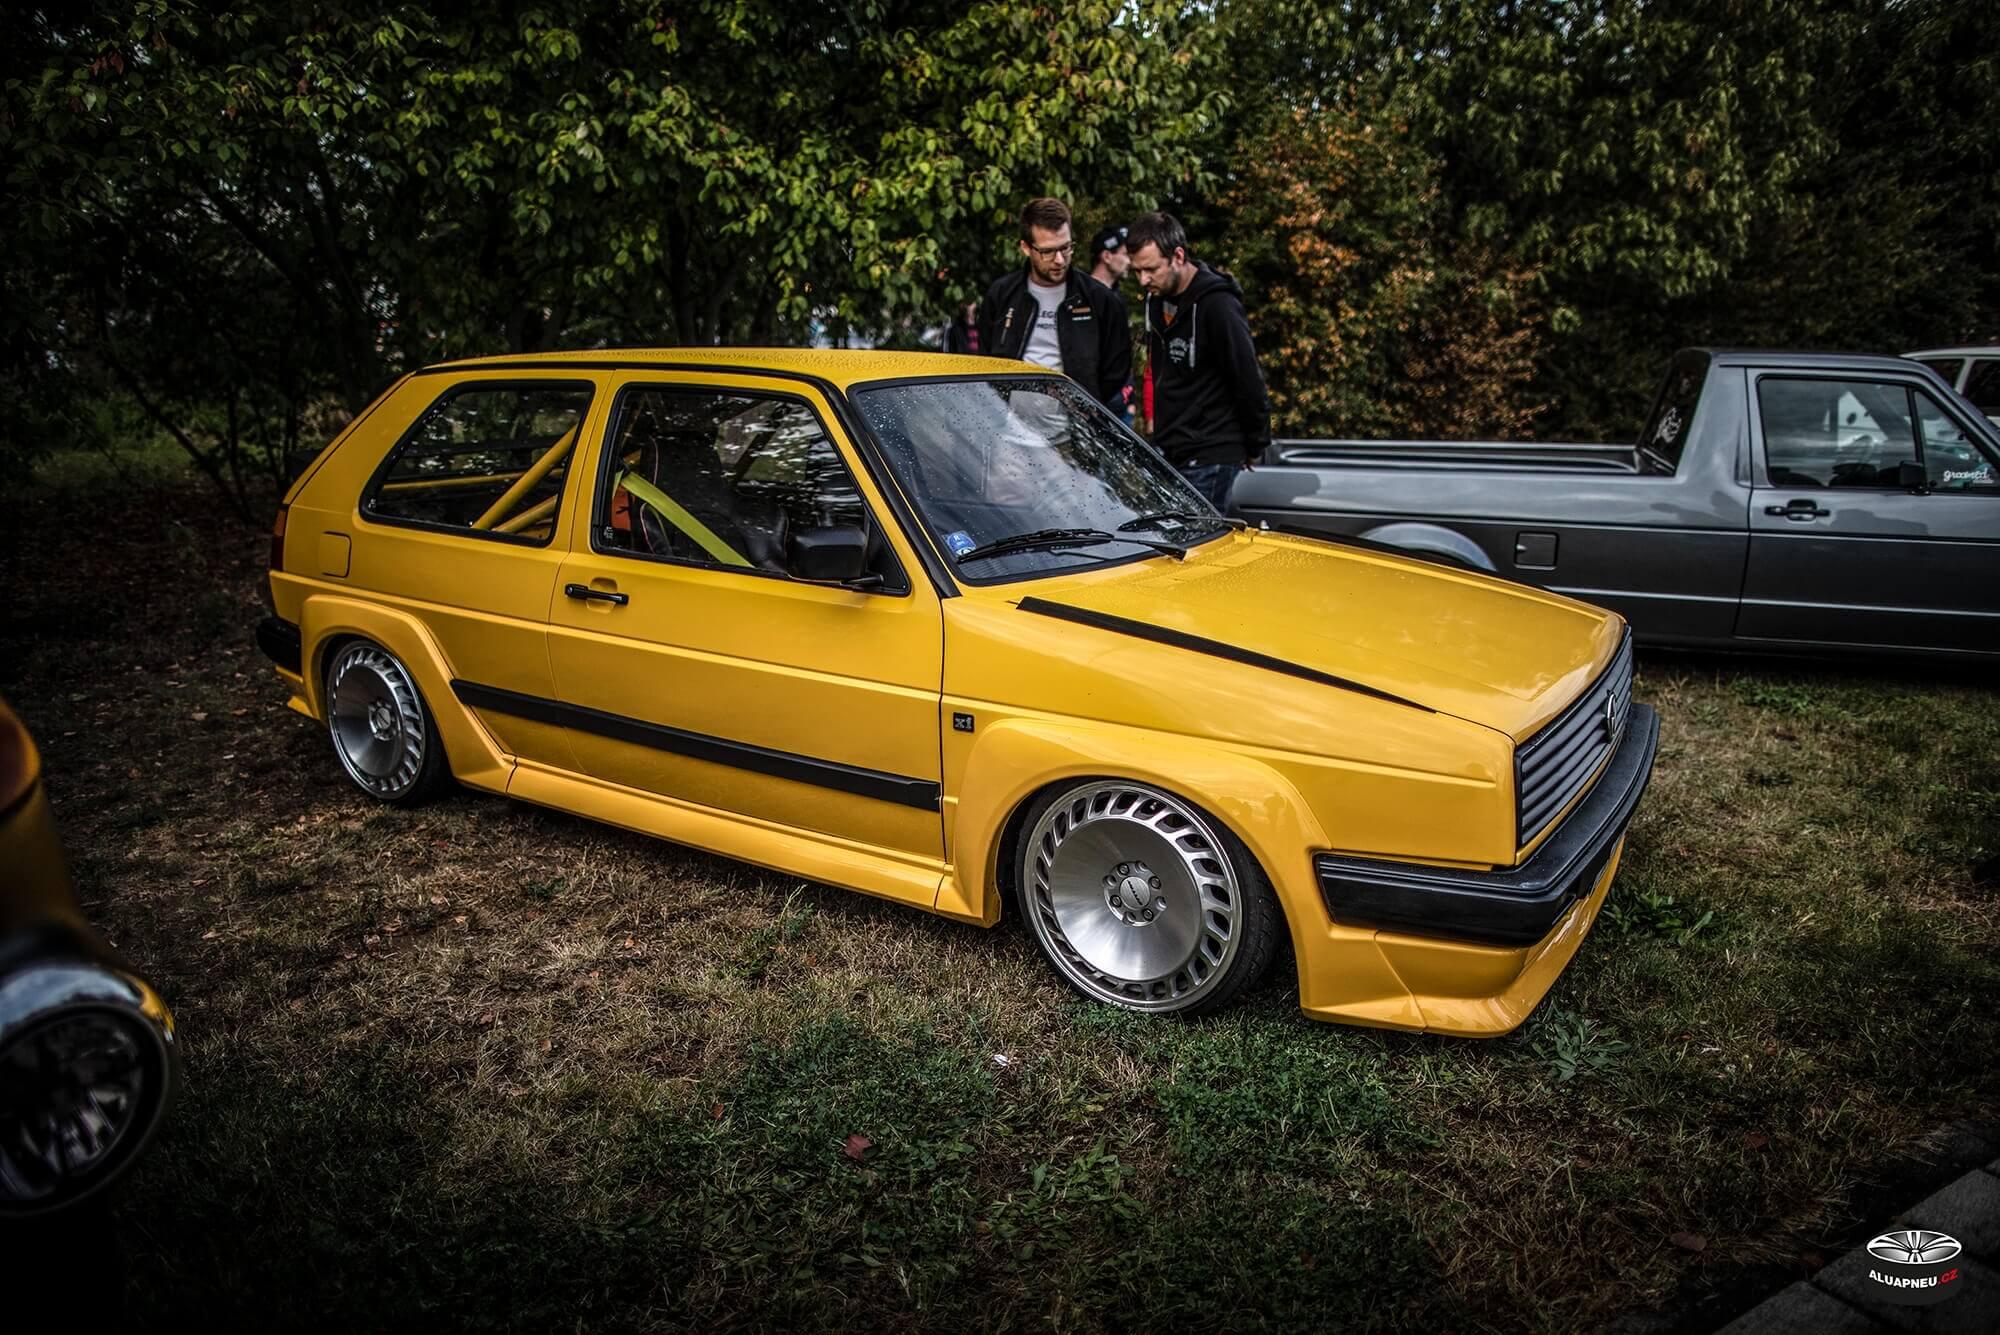 Tuning elektrony Messer - Volkswagen Golf 2 - XS Classic Carnight 5.0 - Drážďany tuning sraz 2019 - www.aluapneu.cz